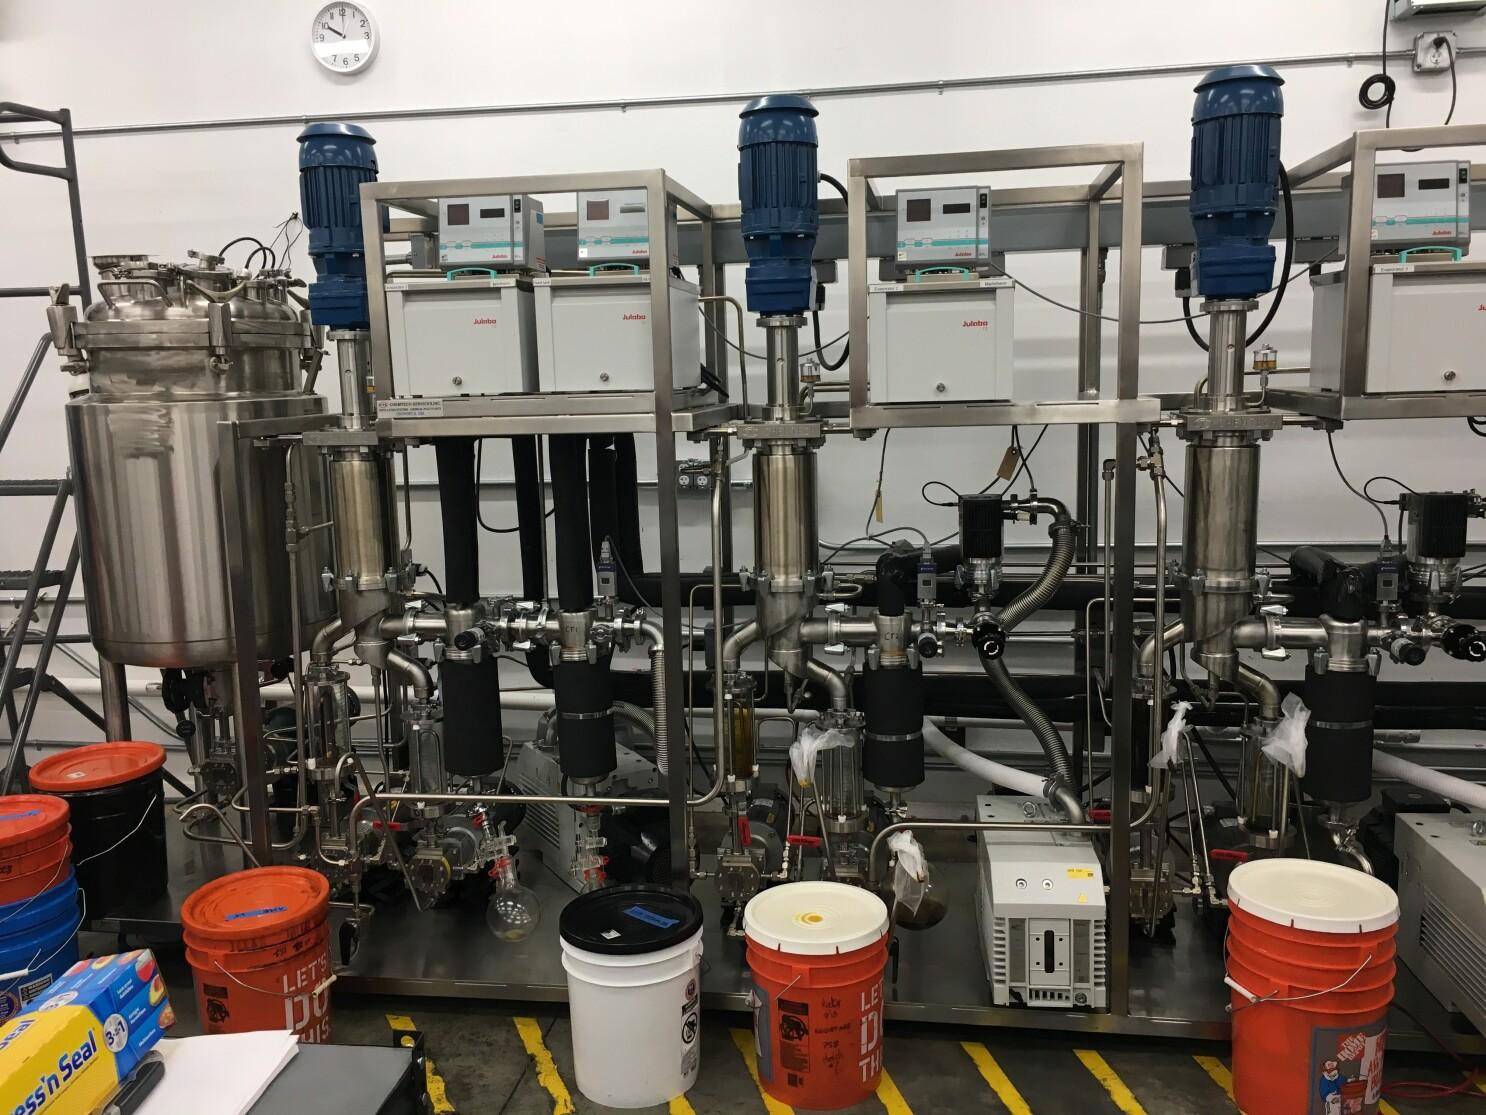 DEA raids 'sophisticated' hash oil lab in Lemon Grove